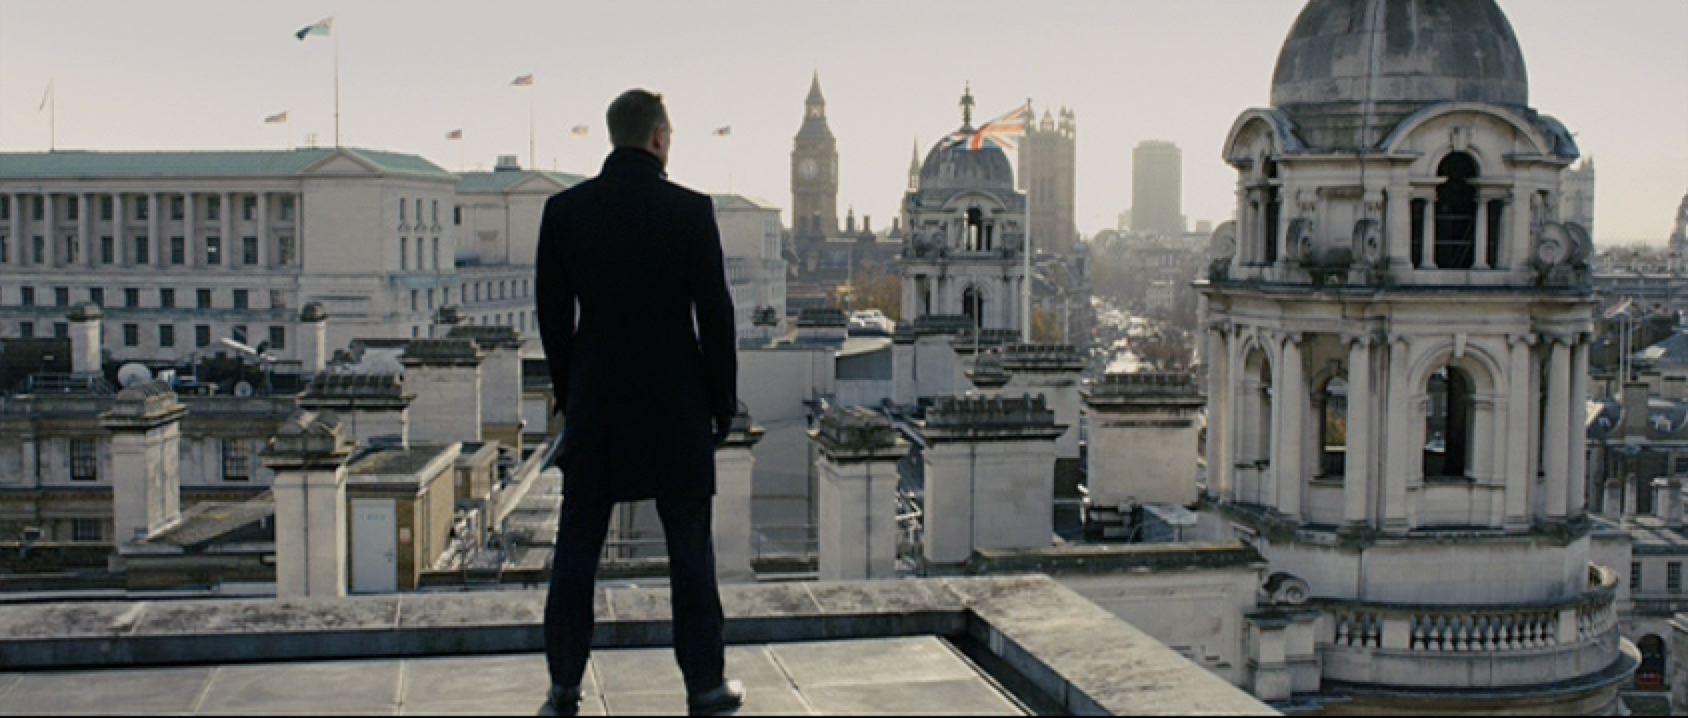 007 Secrets of James Bonds Timeless Style  Primer